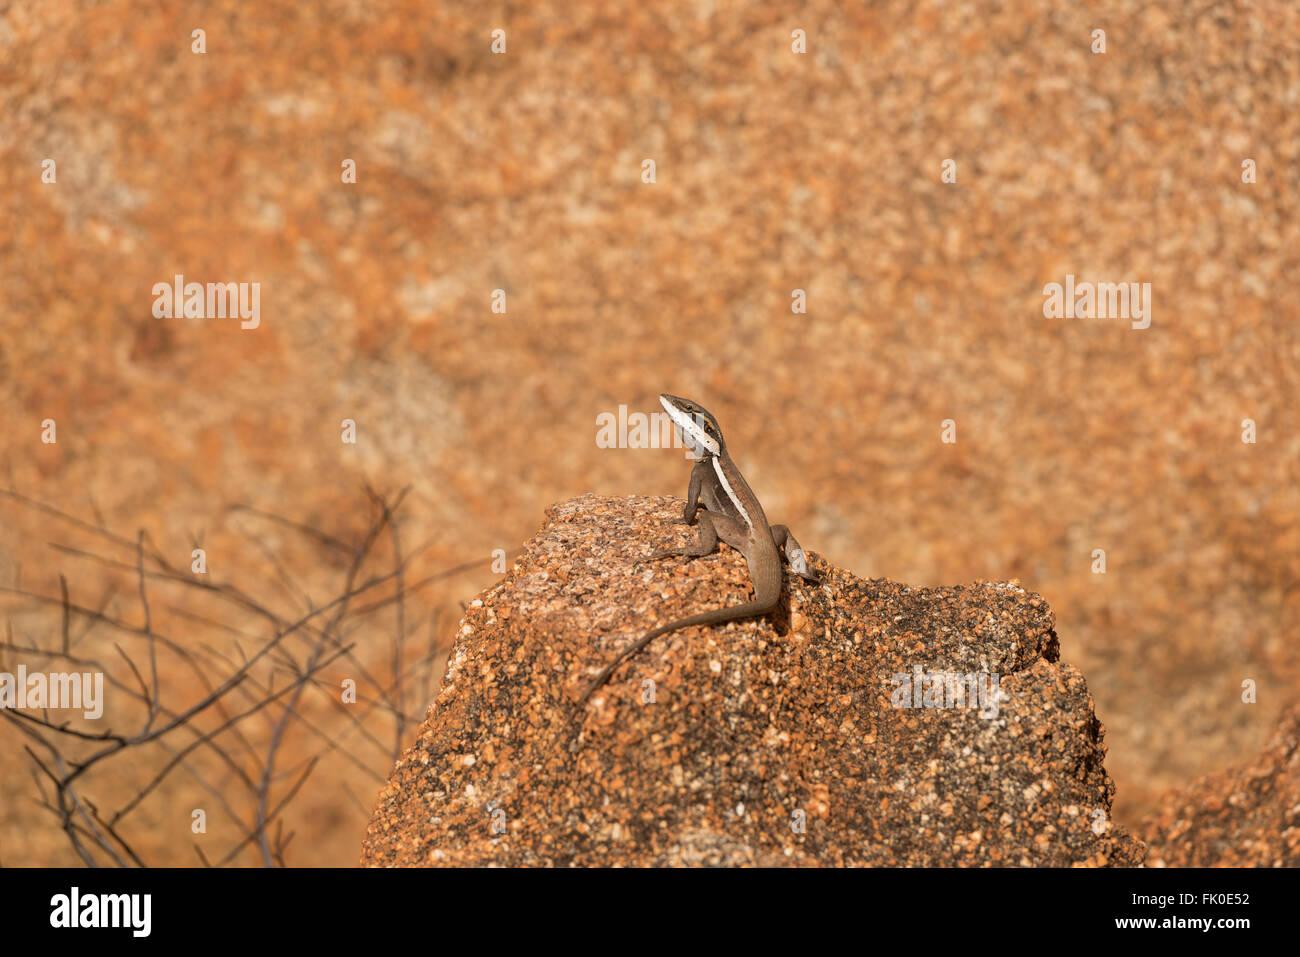 Long-nosed Dragon (Amphibolurus longirostris) on a granite boulder of the Devils Marbles. - Stock Image